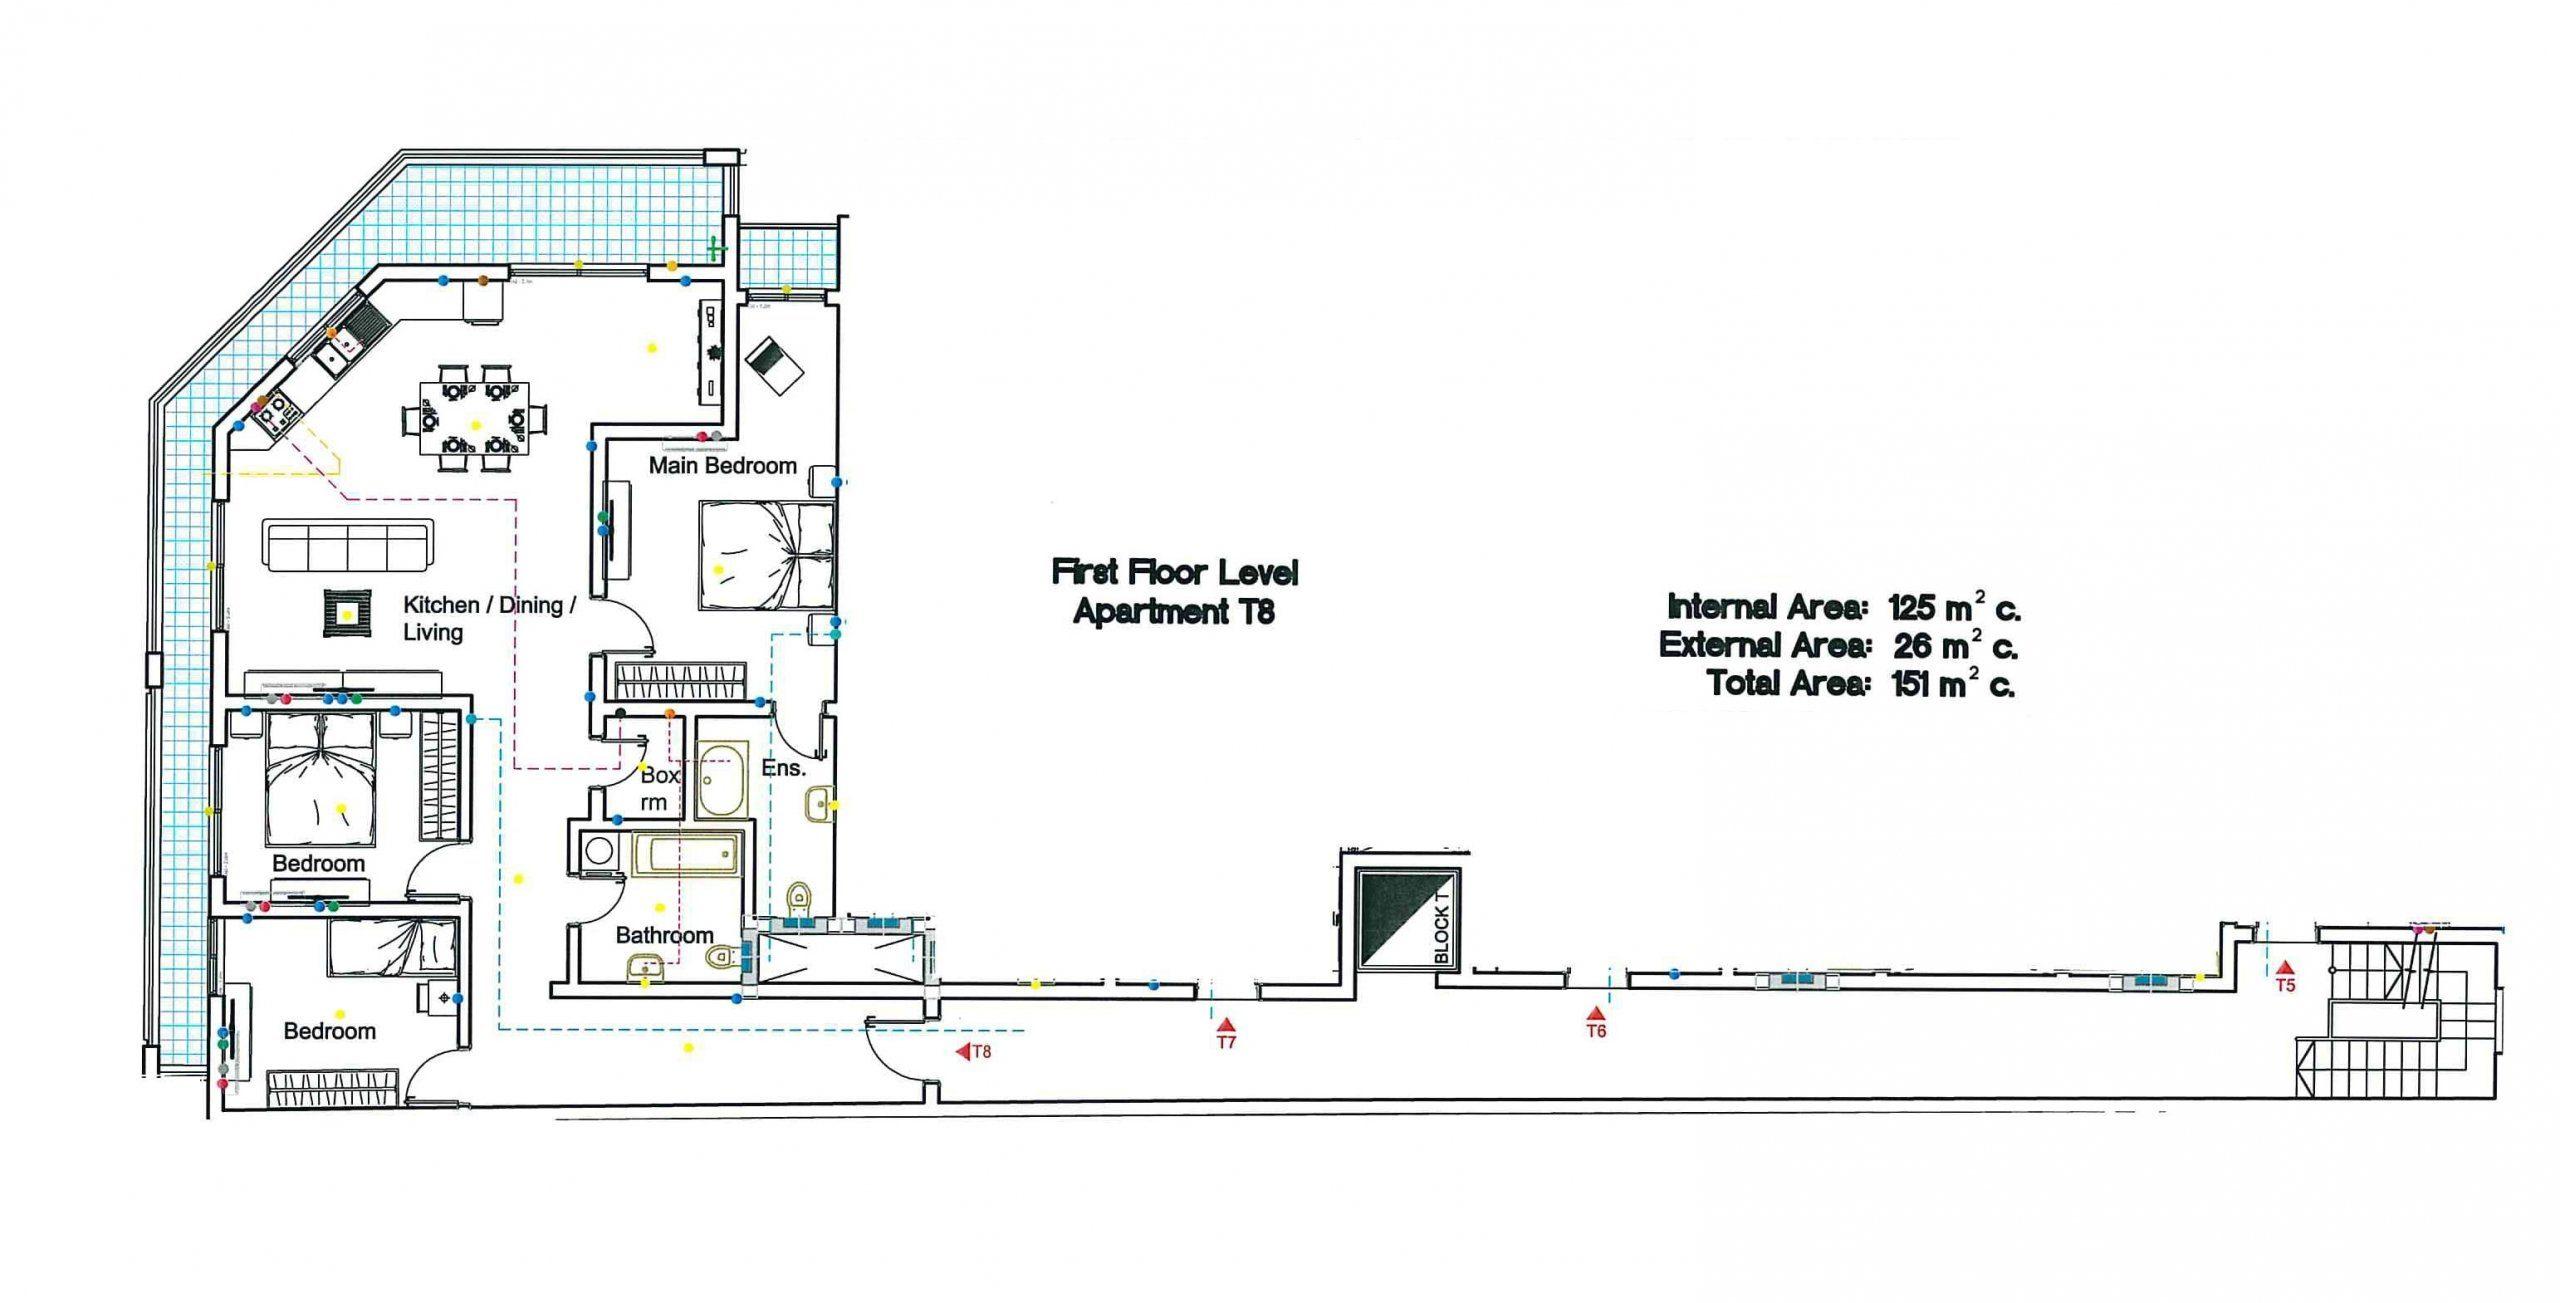 T8 First Floor